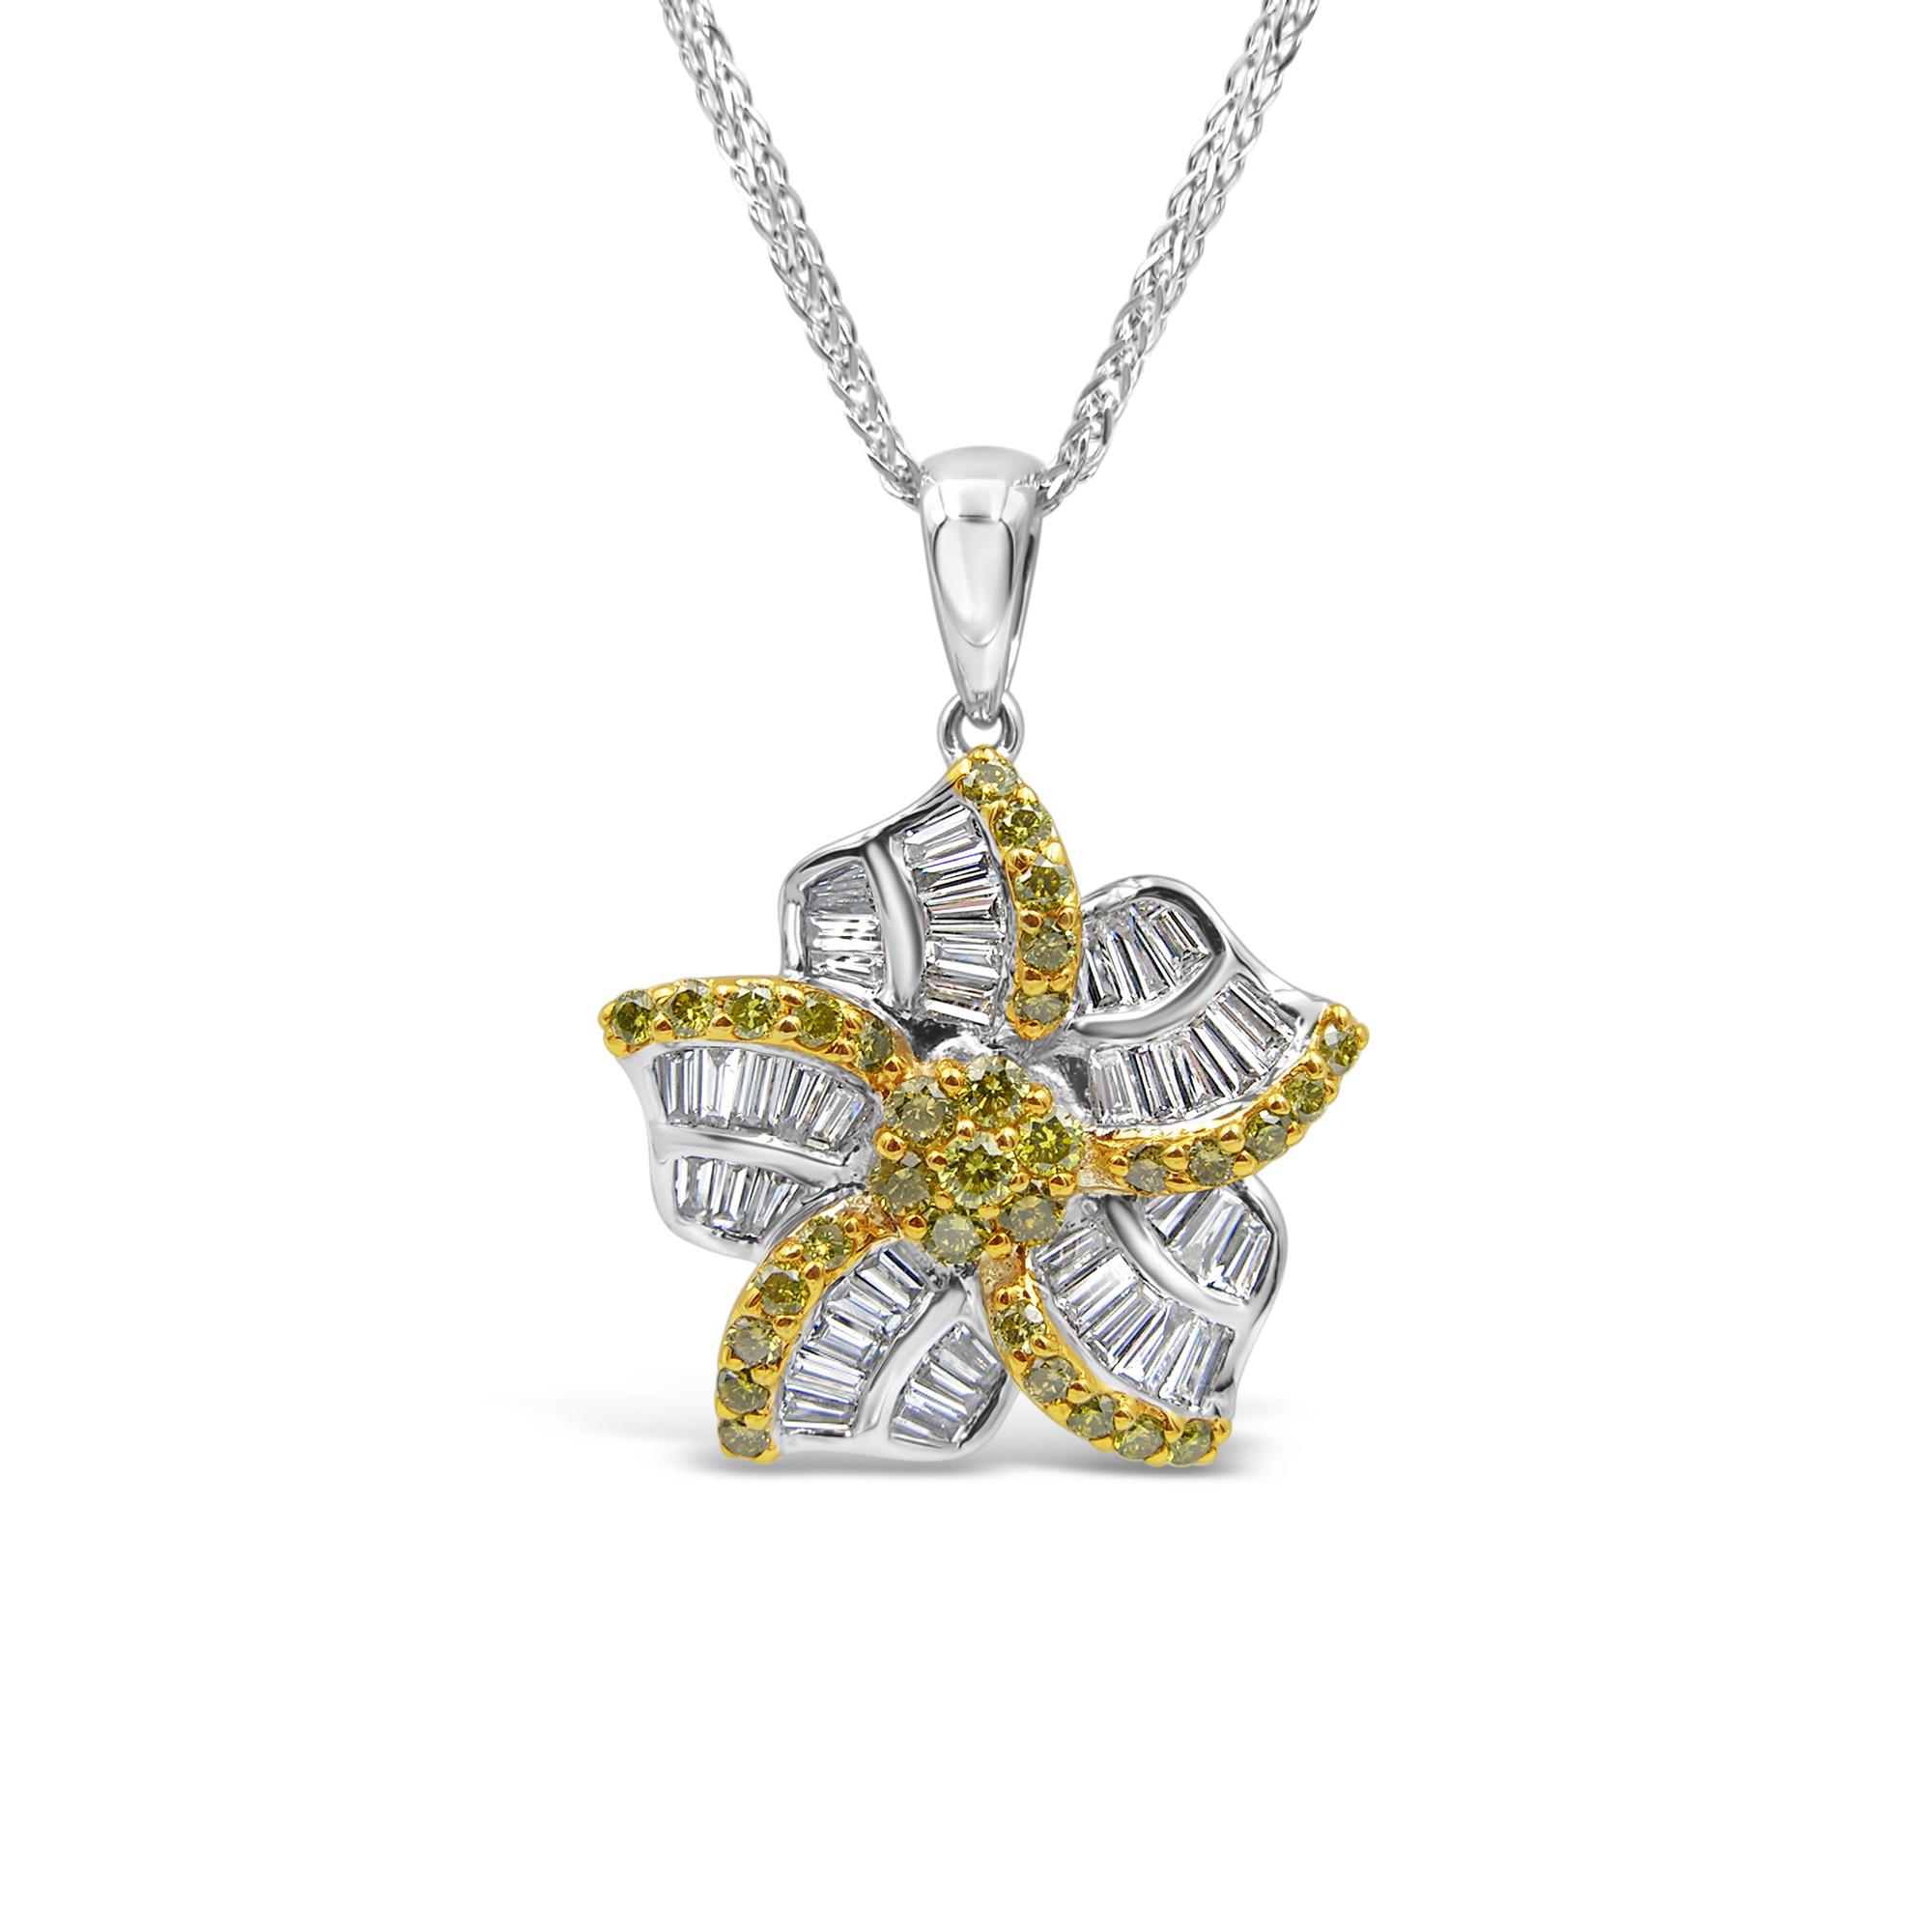 18k white gold pendant with 1.50 ct diamonds